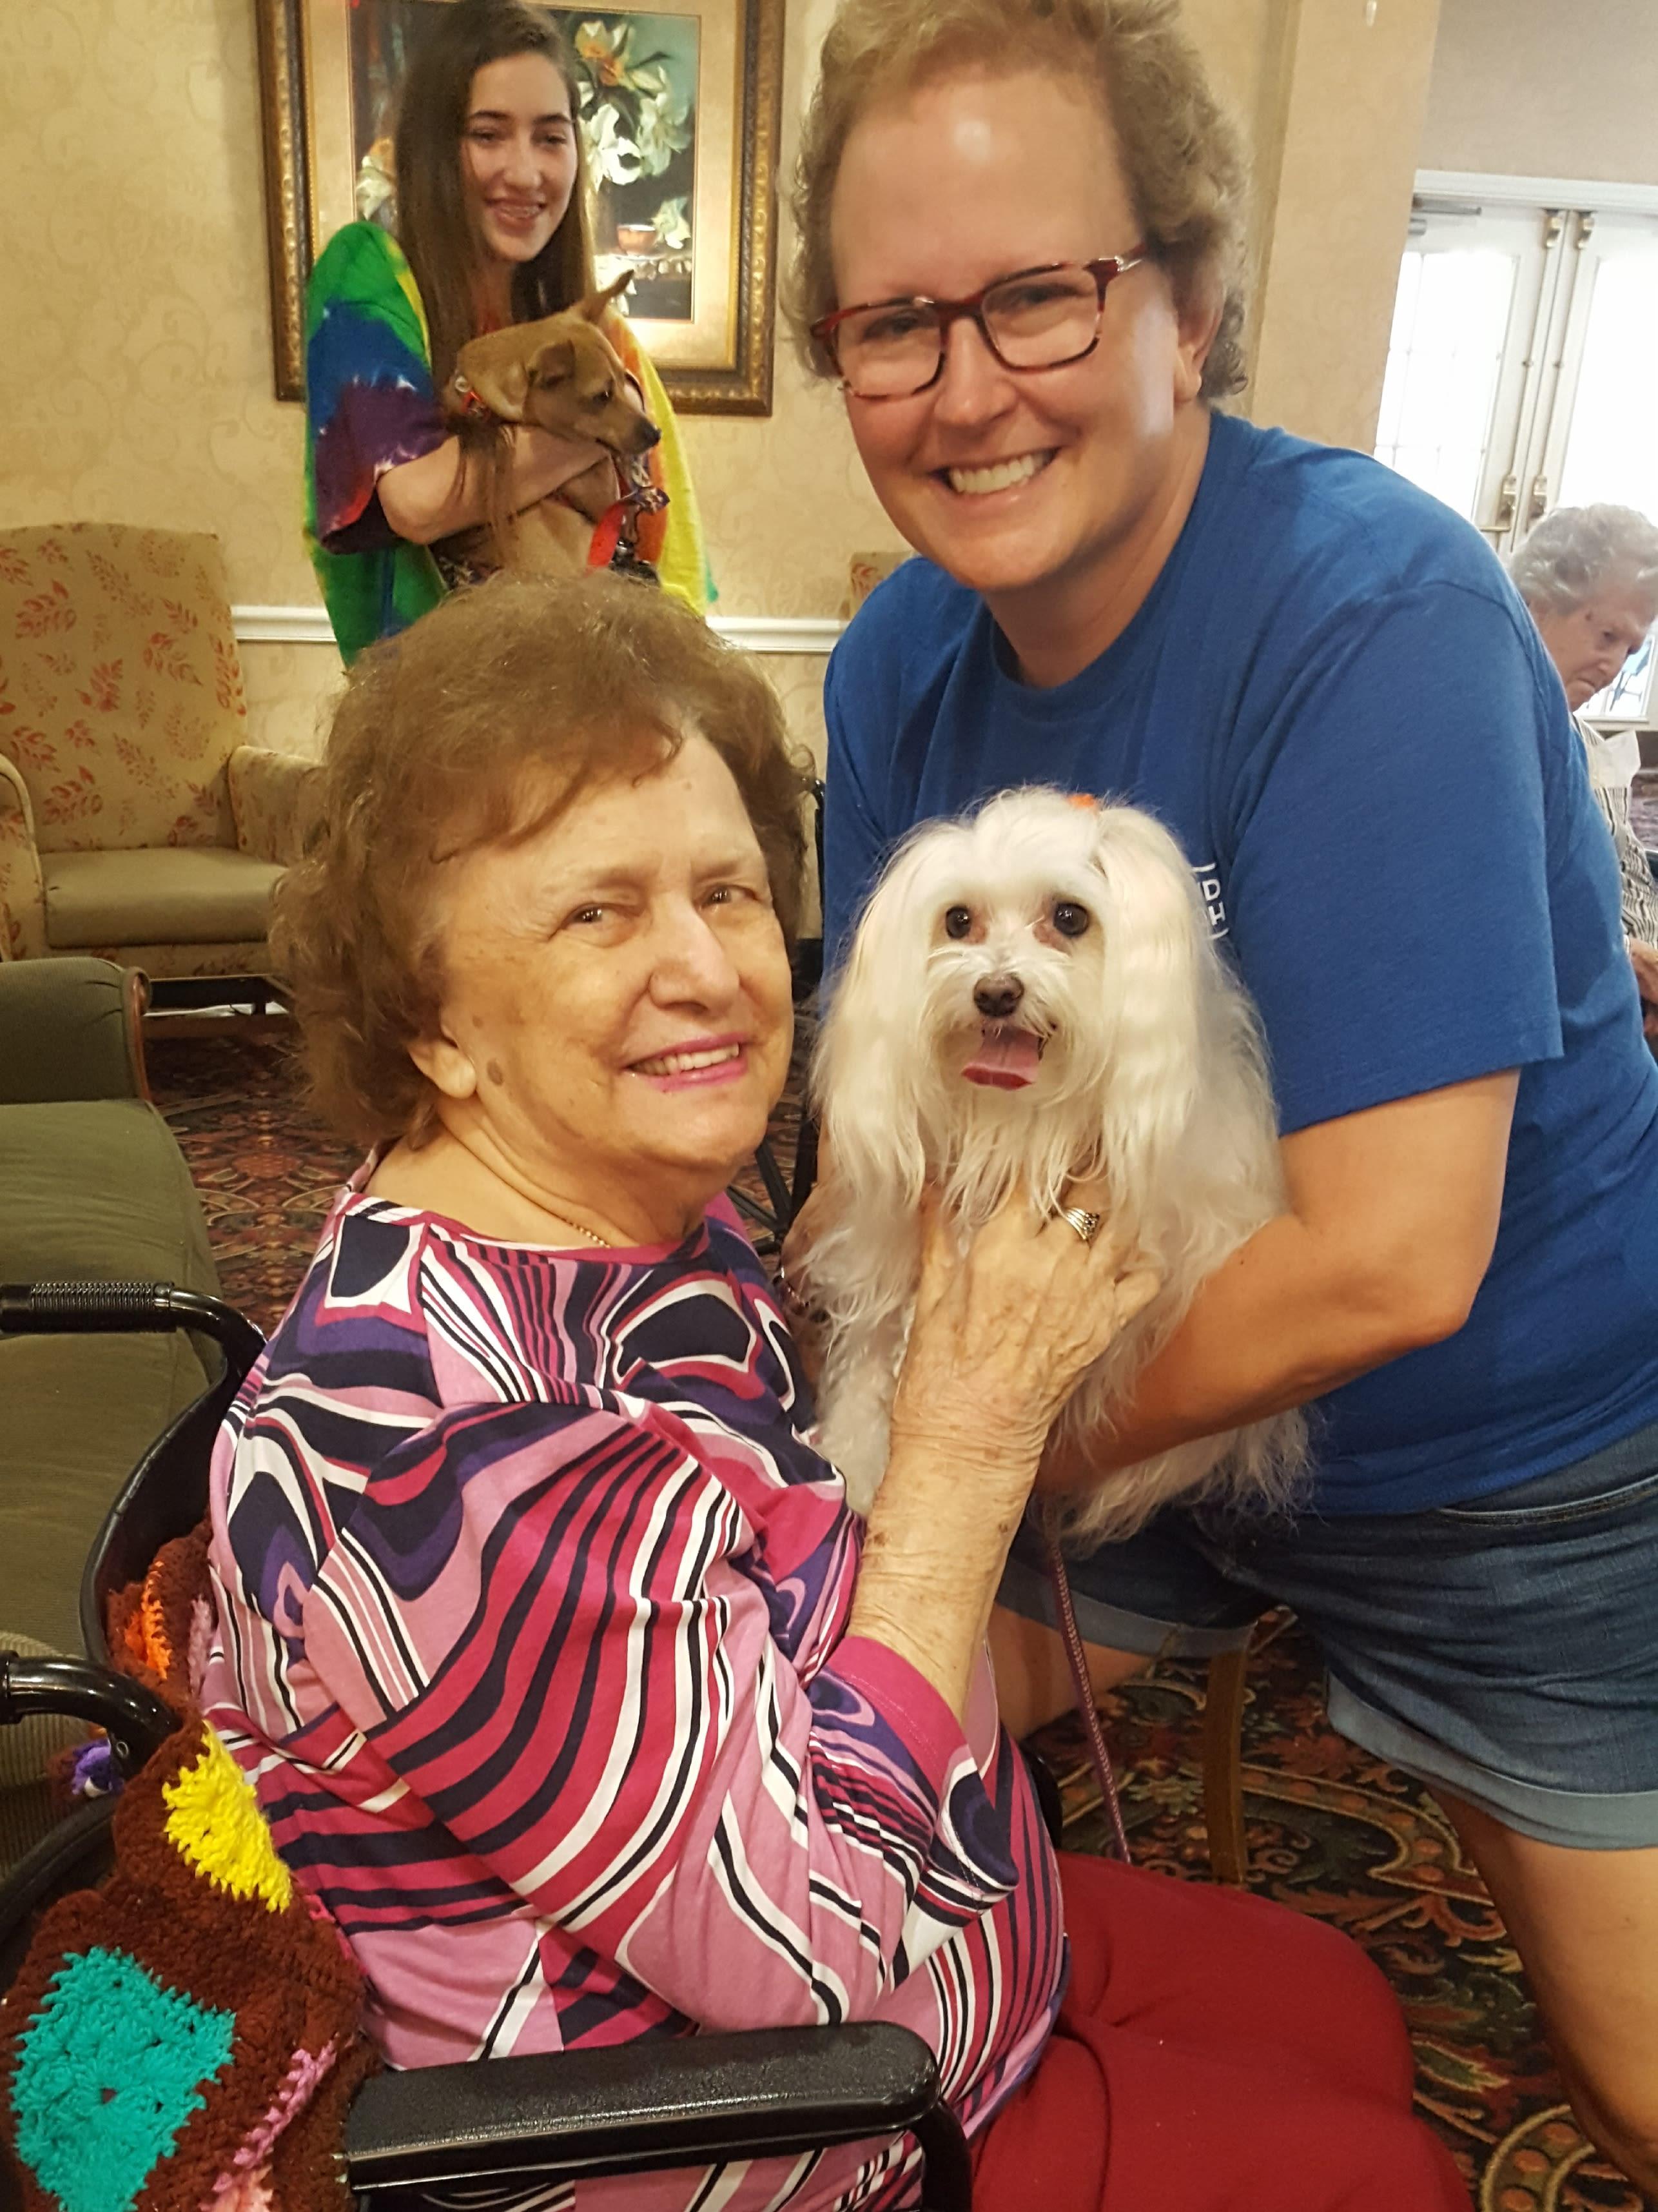 Resident at Savannah Court of Maitland Senior Living in Maitland Florida